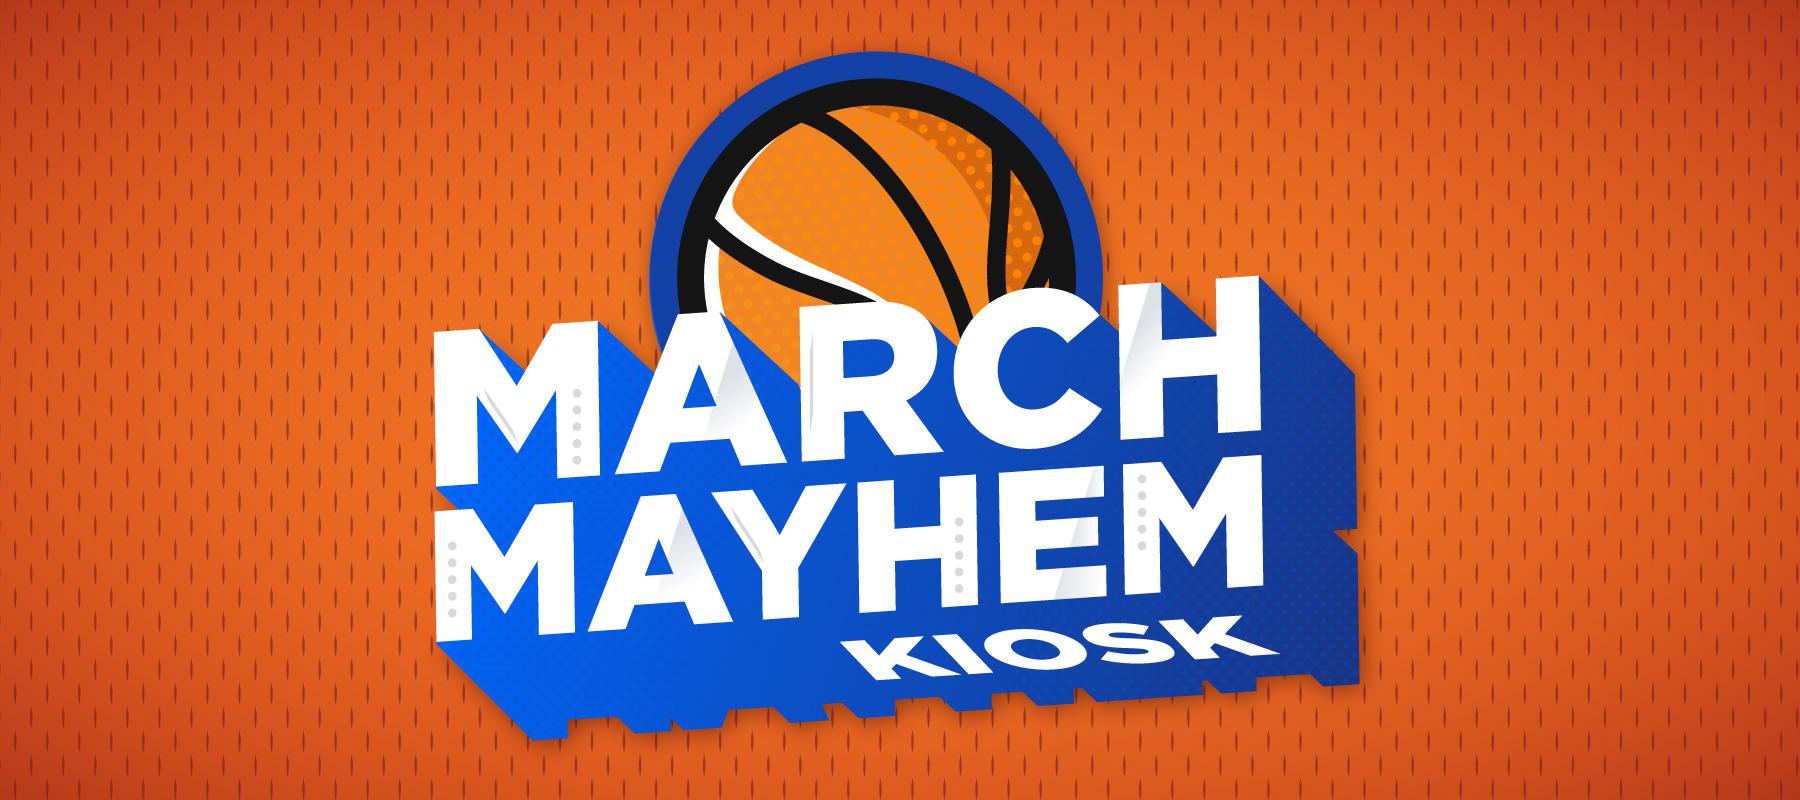 March Mayhem Kiosk